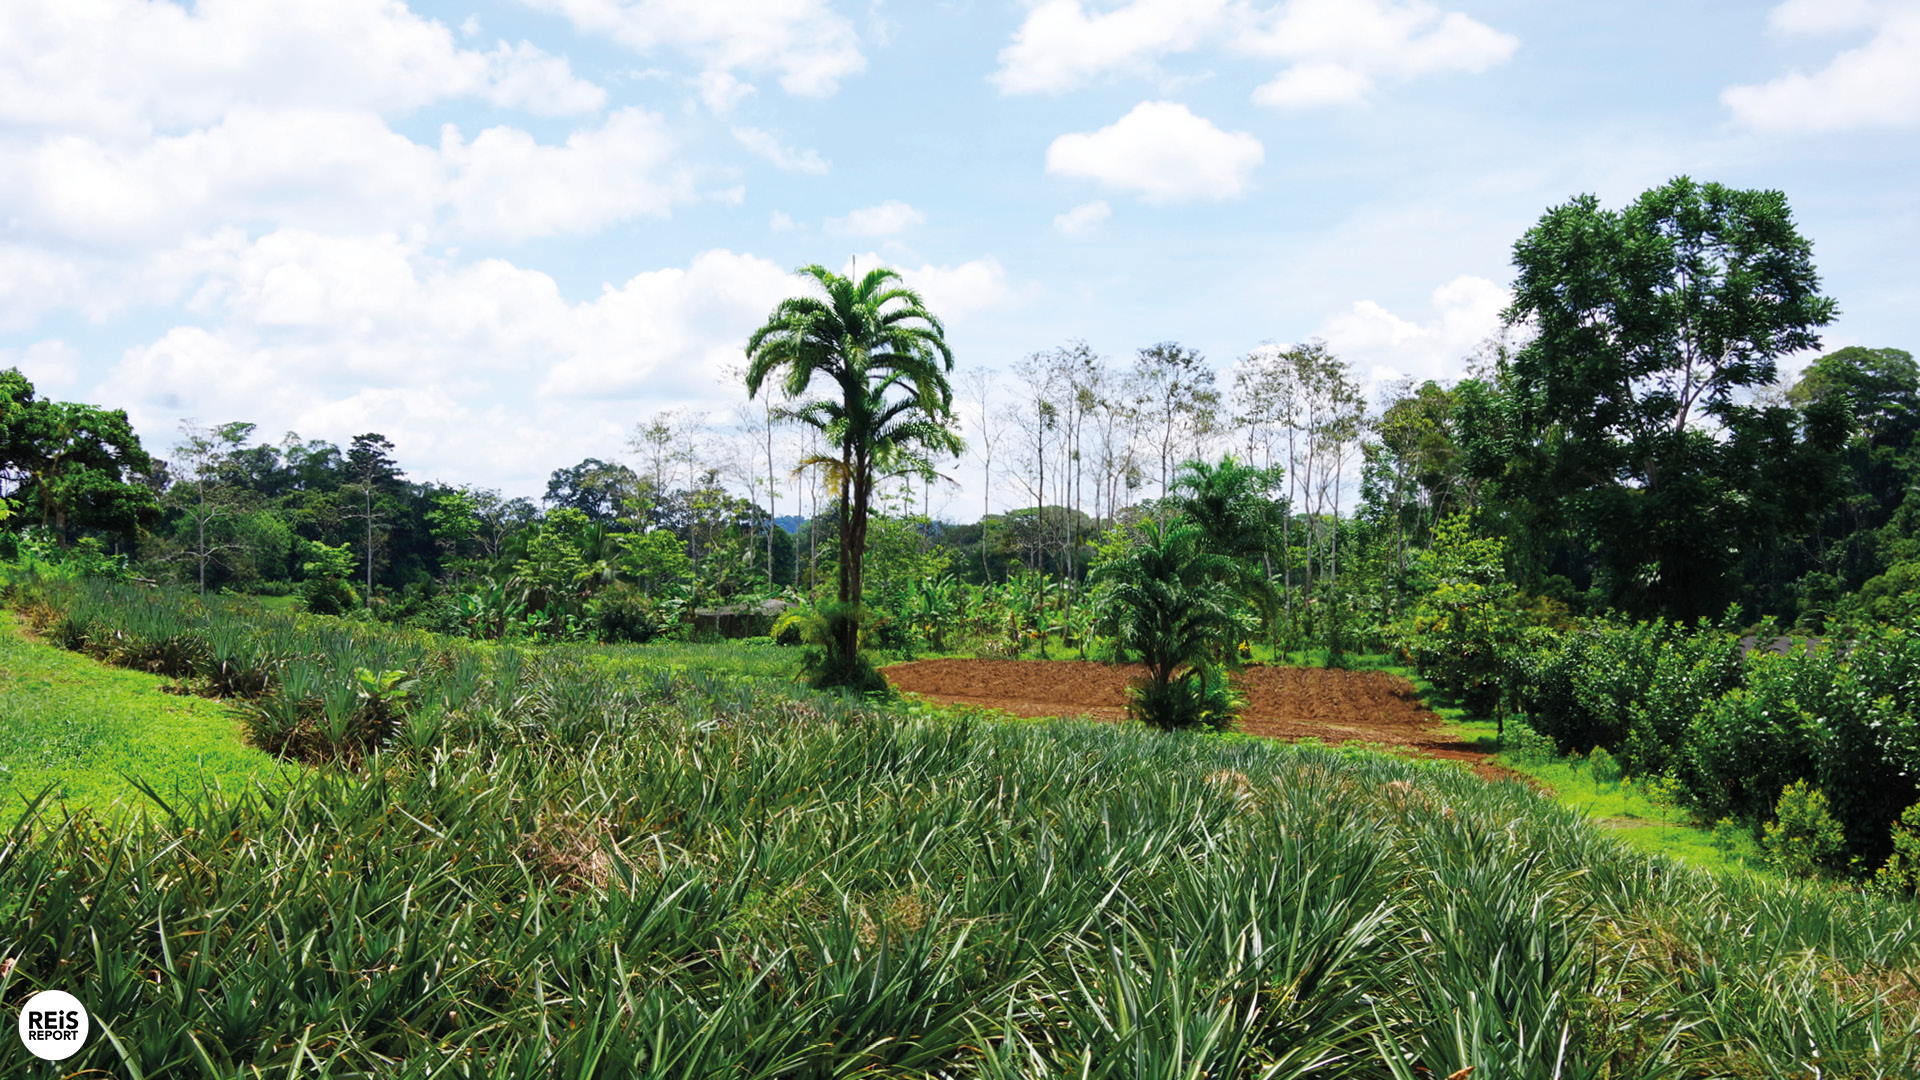 excursie costa rica ananasboer